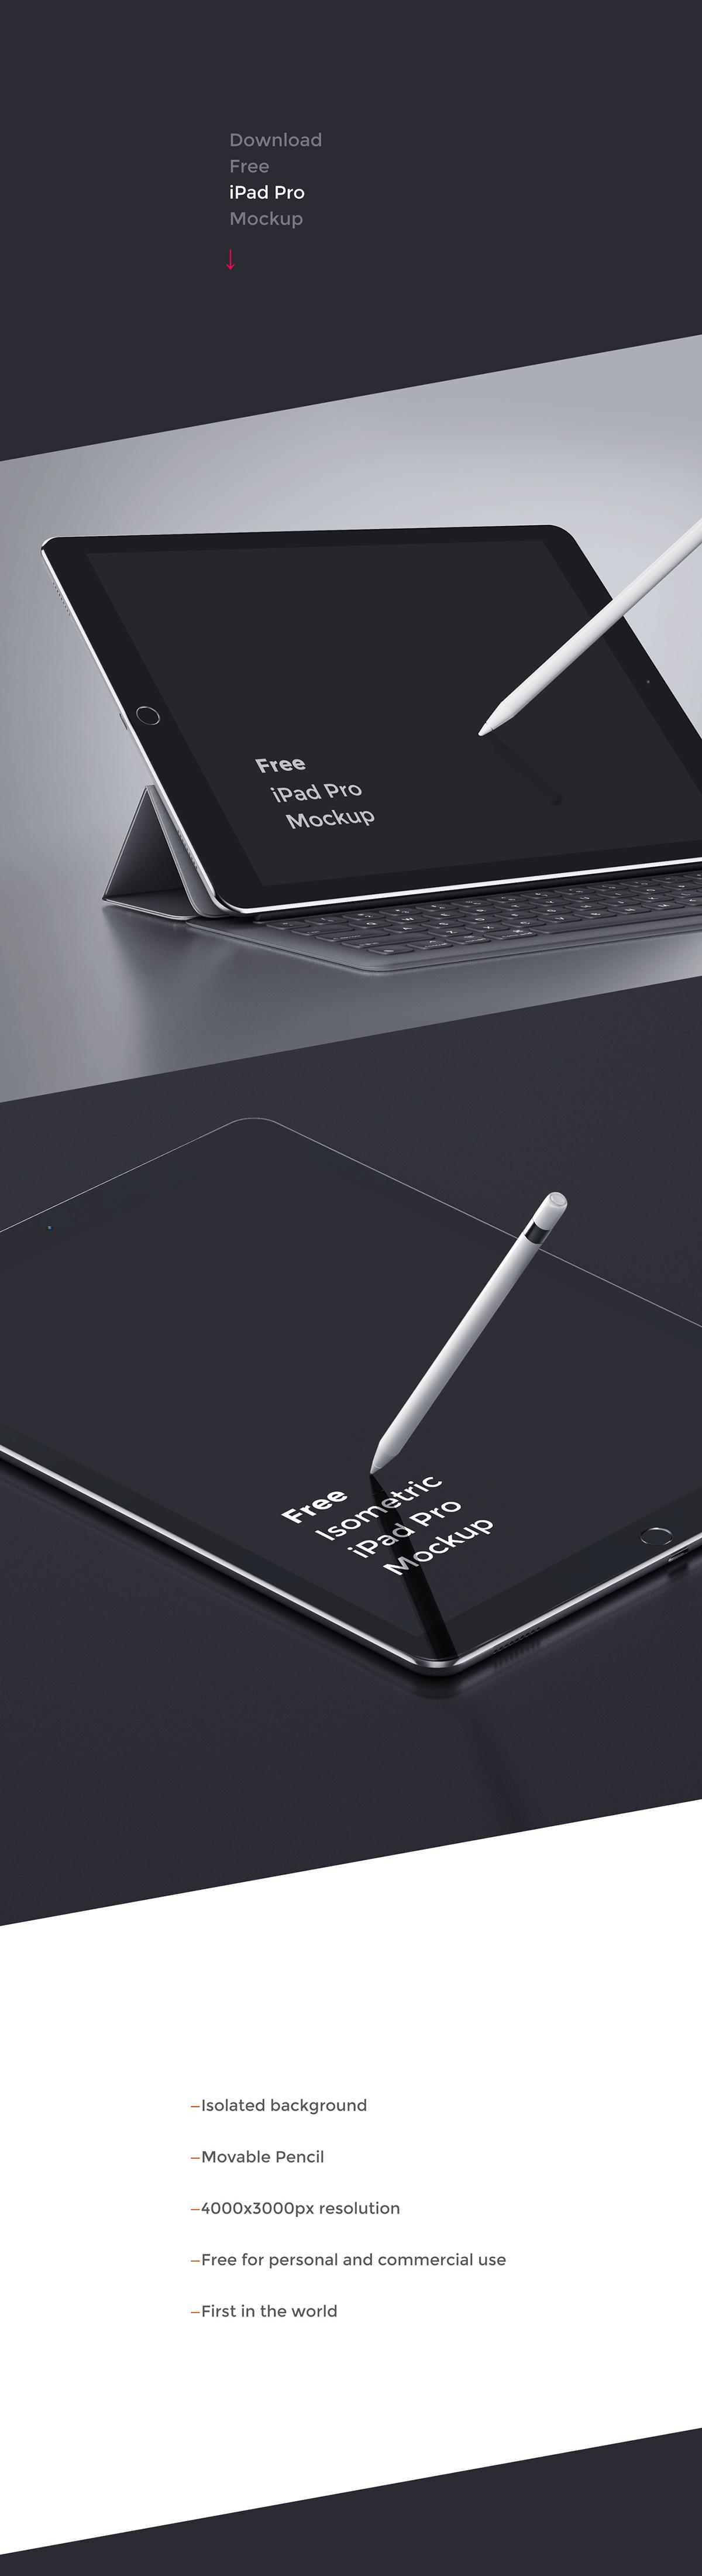 iPad Pro Free Mockup for UI UX designers